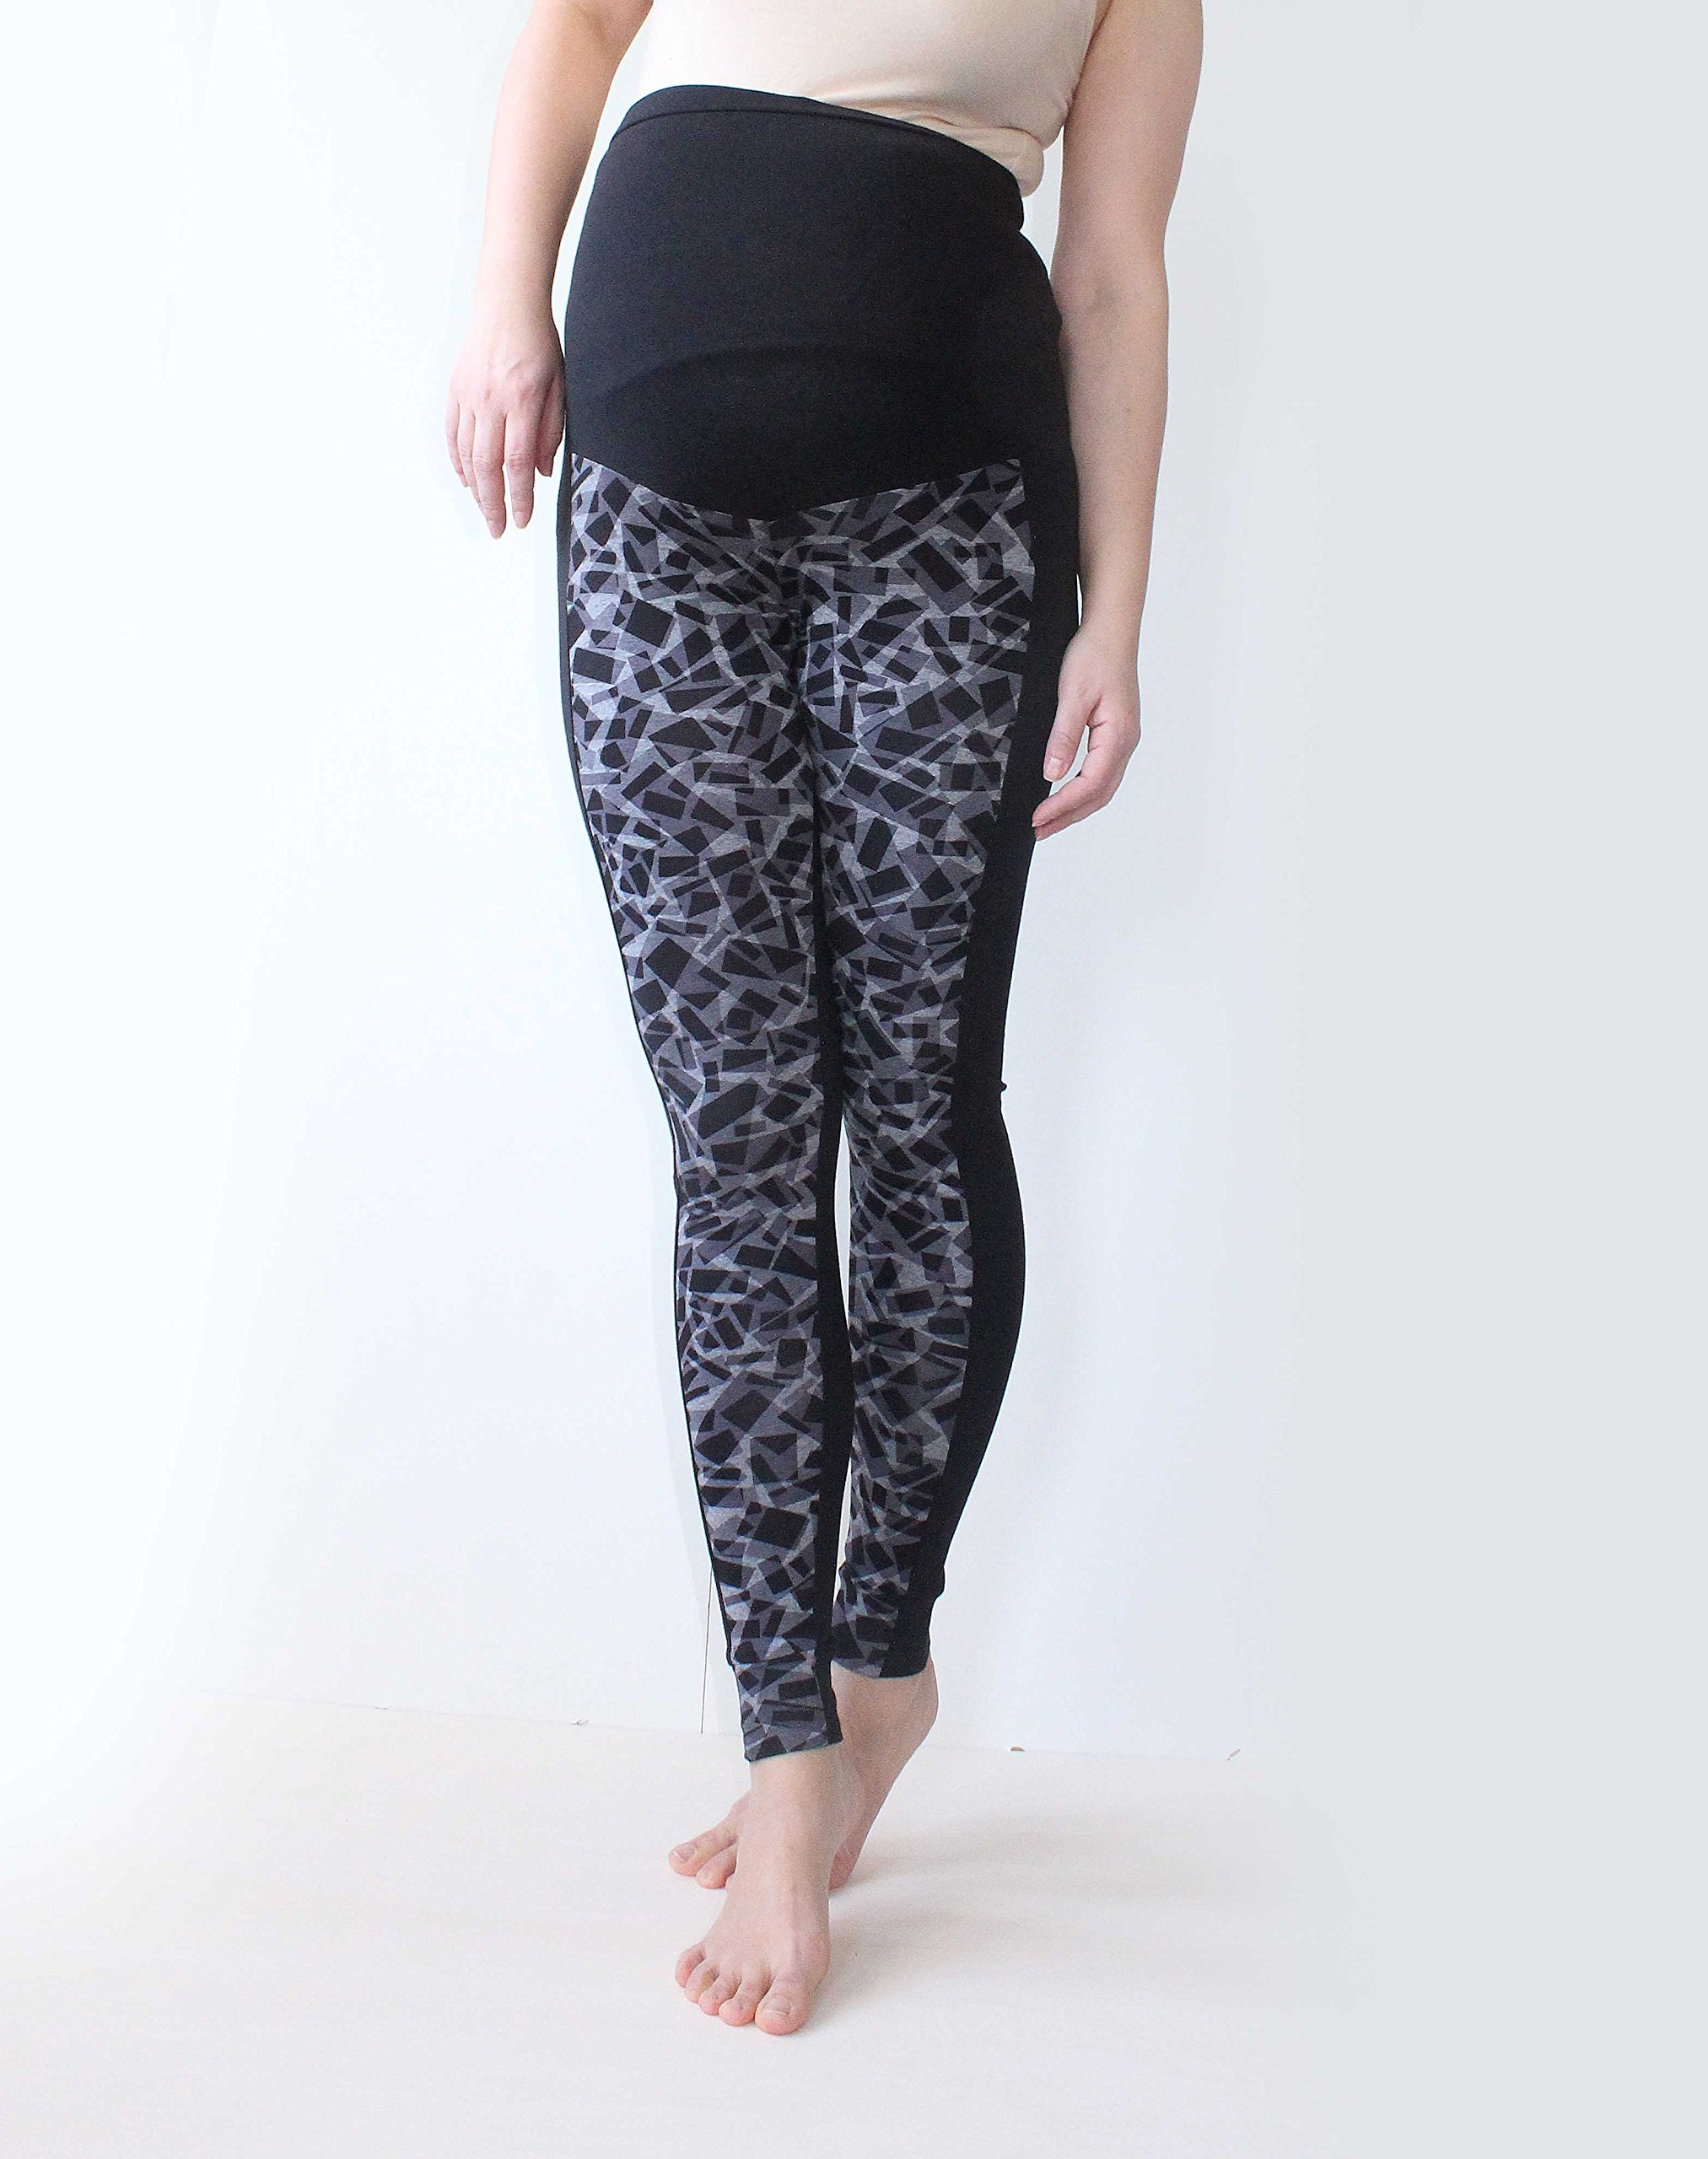 Mirror Print Over Bump,Gray S, Aztec Galaxy Black No See Through Maternity Leggings Maternity Leggings